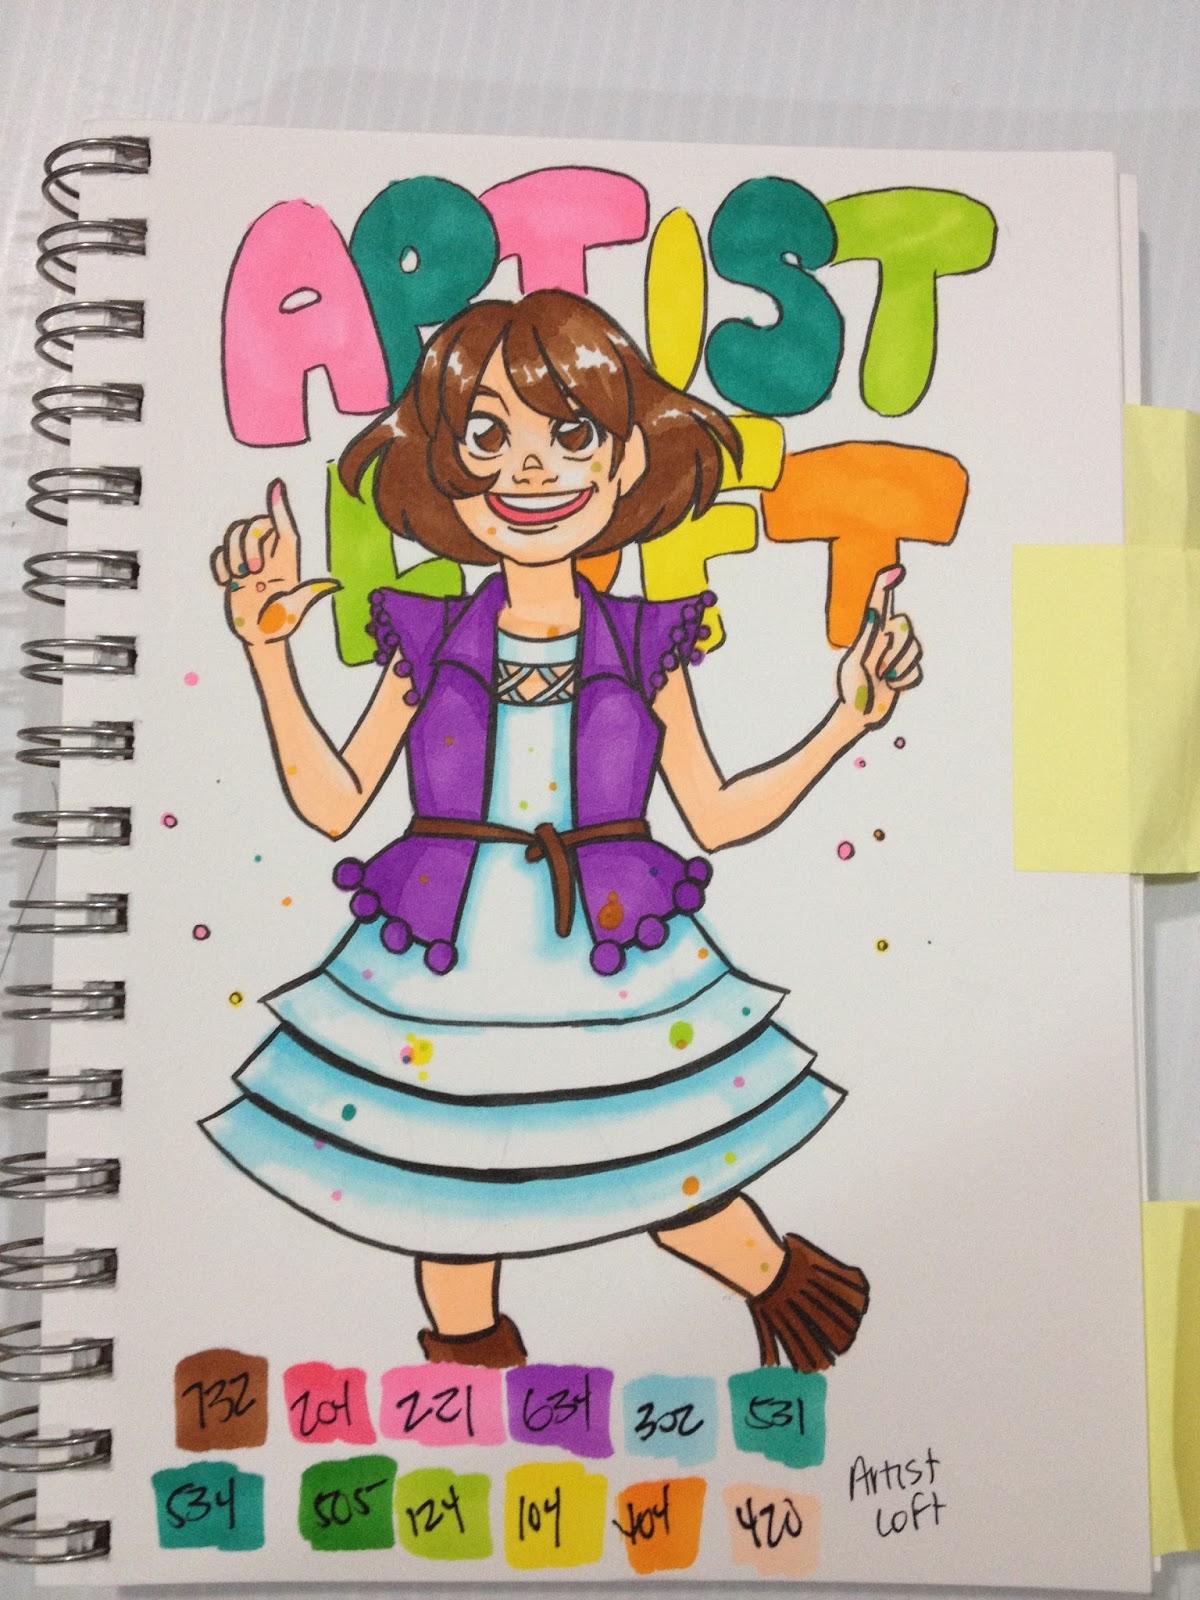 Nattosoup Studio Art And Process Blog Alcohol Based